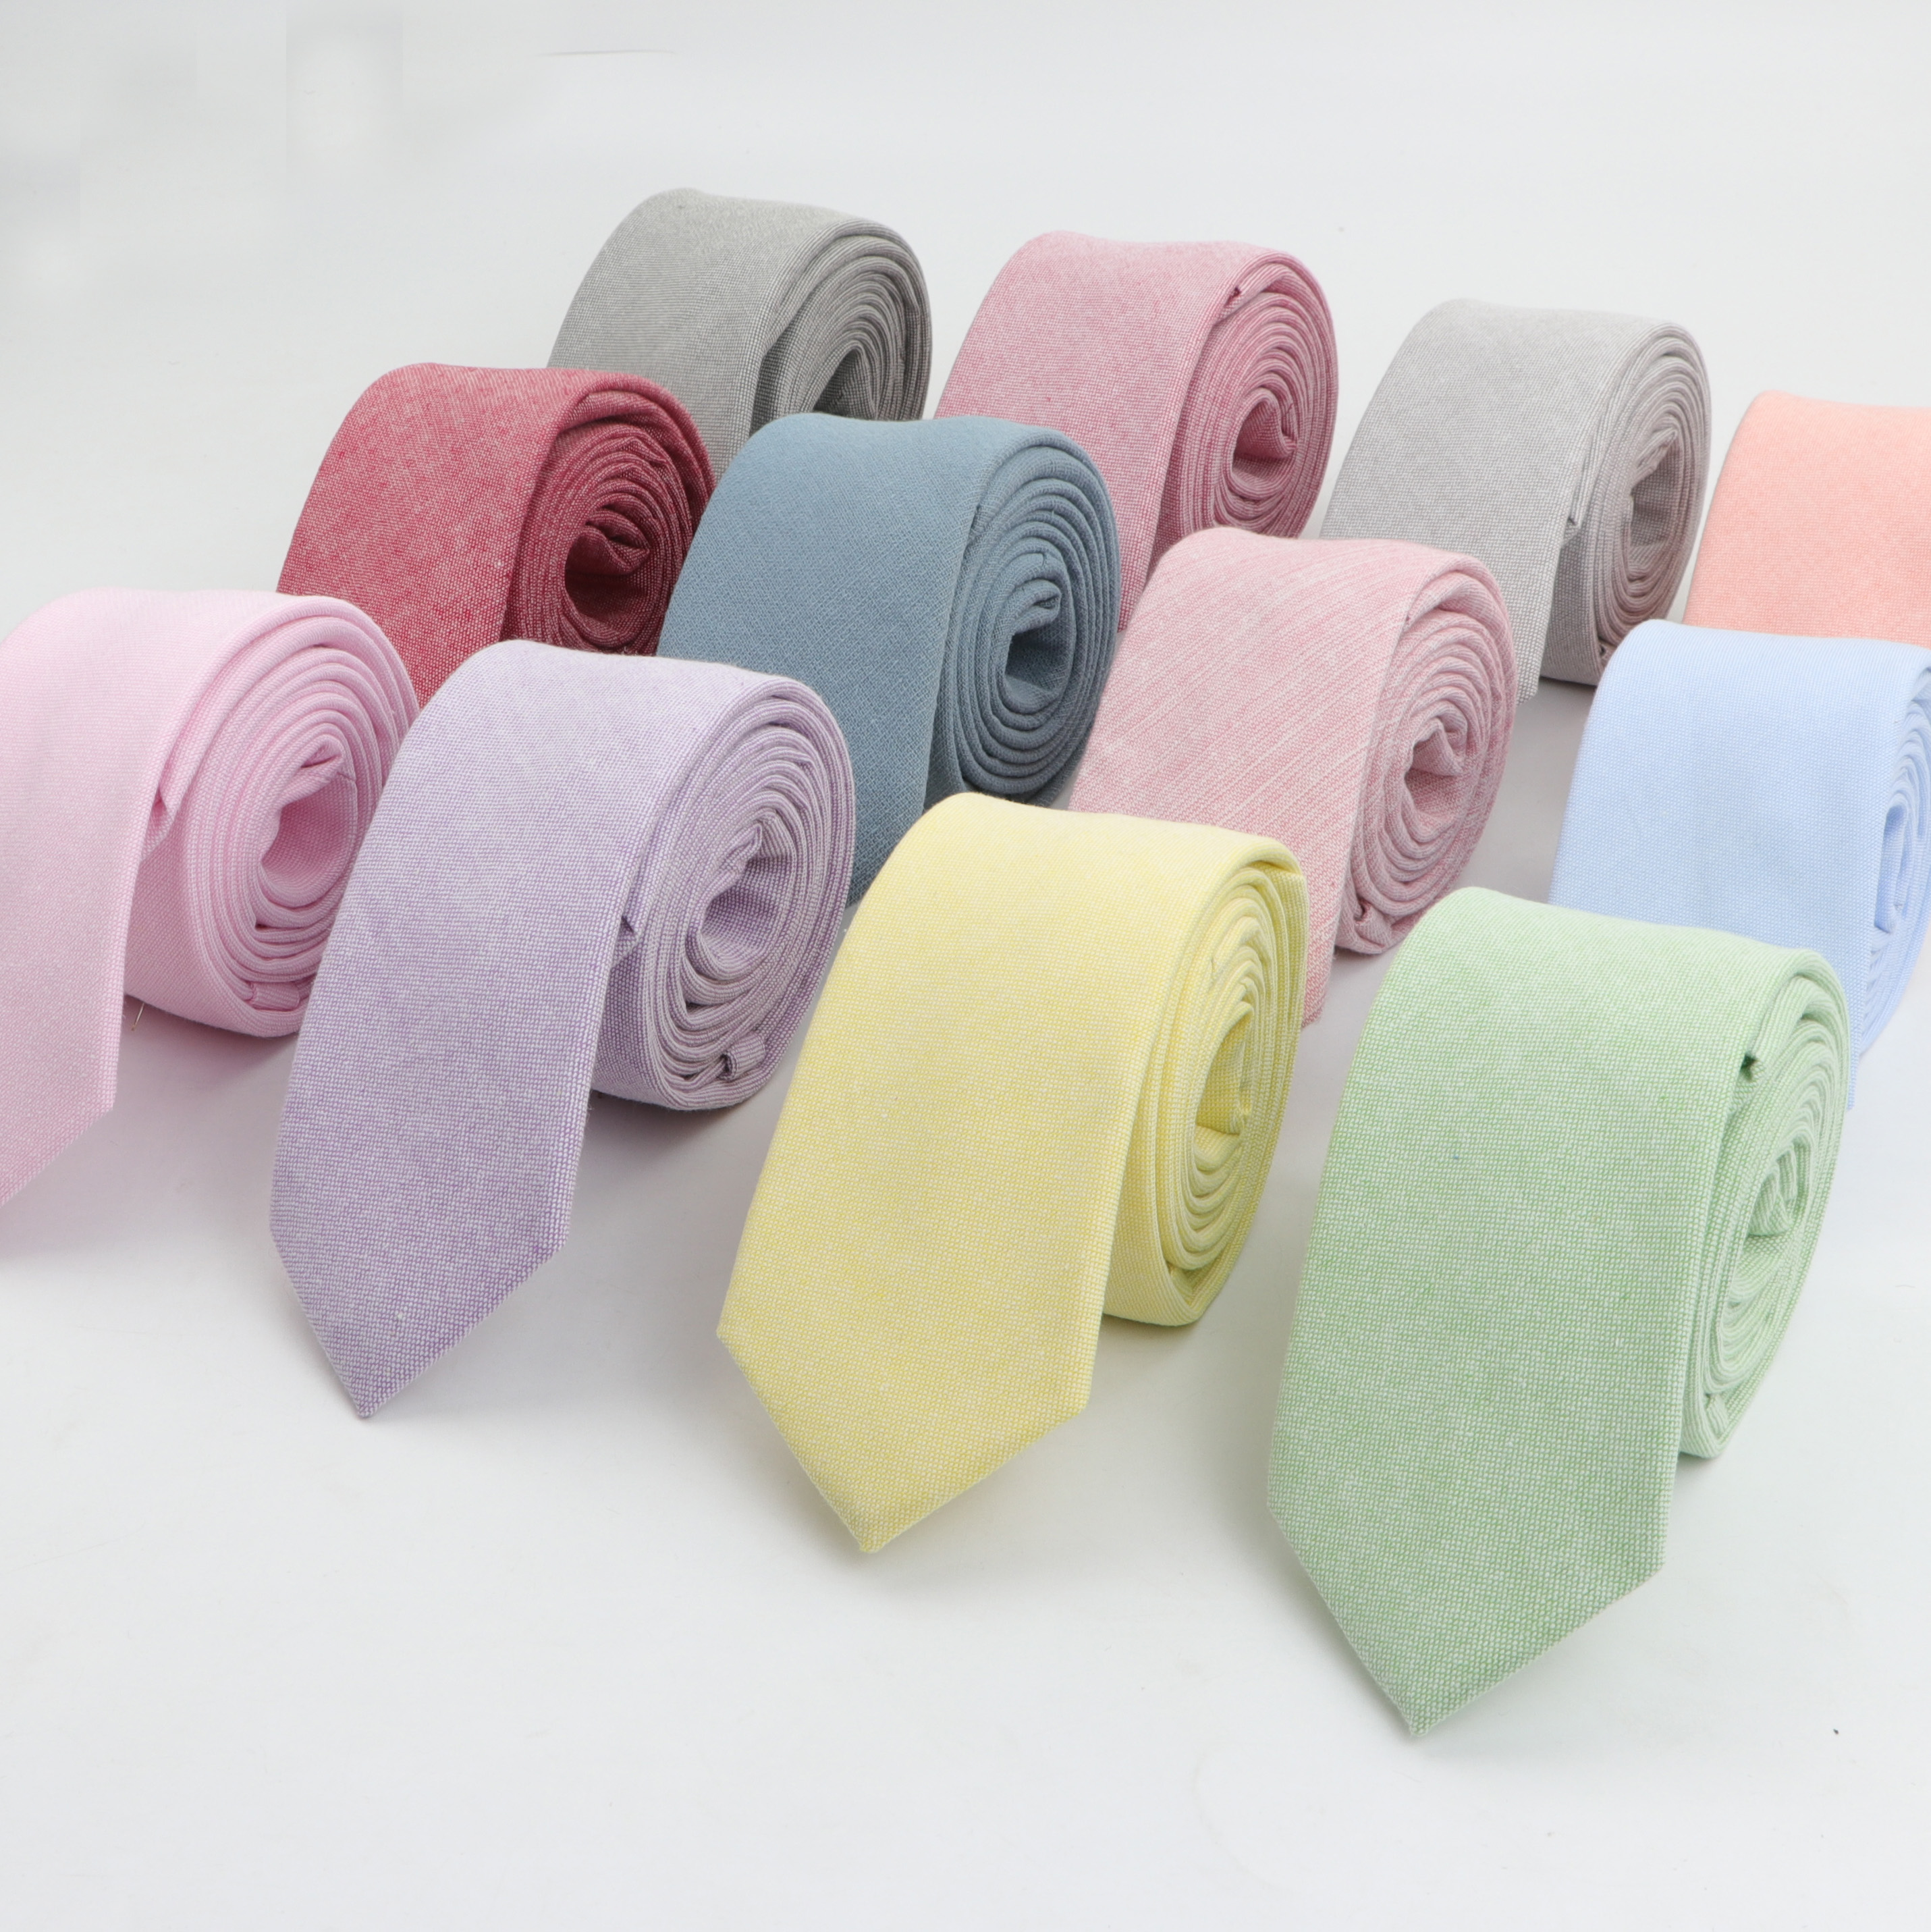 Solid Color 6cm Width Tie Cotton Pure Colorful Slim Neckties For Wedding Ties Skinny Groom Necktie For Men